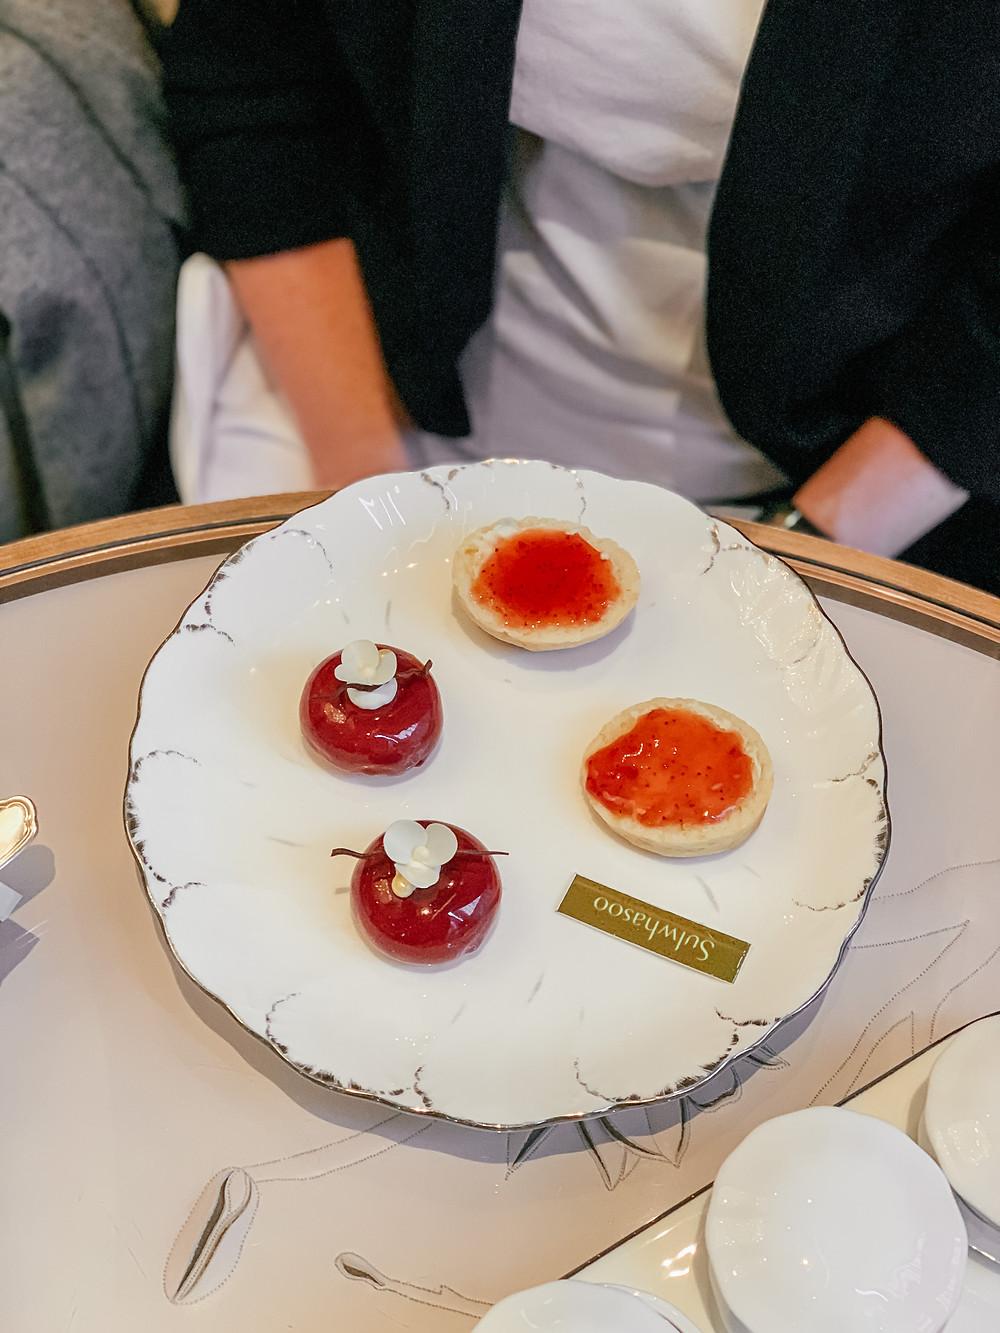 青隅 The Jade Lounge @ Mandarin Oriental Taipei | Afternoon Tea | A Style Alike